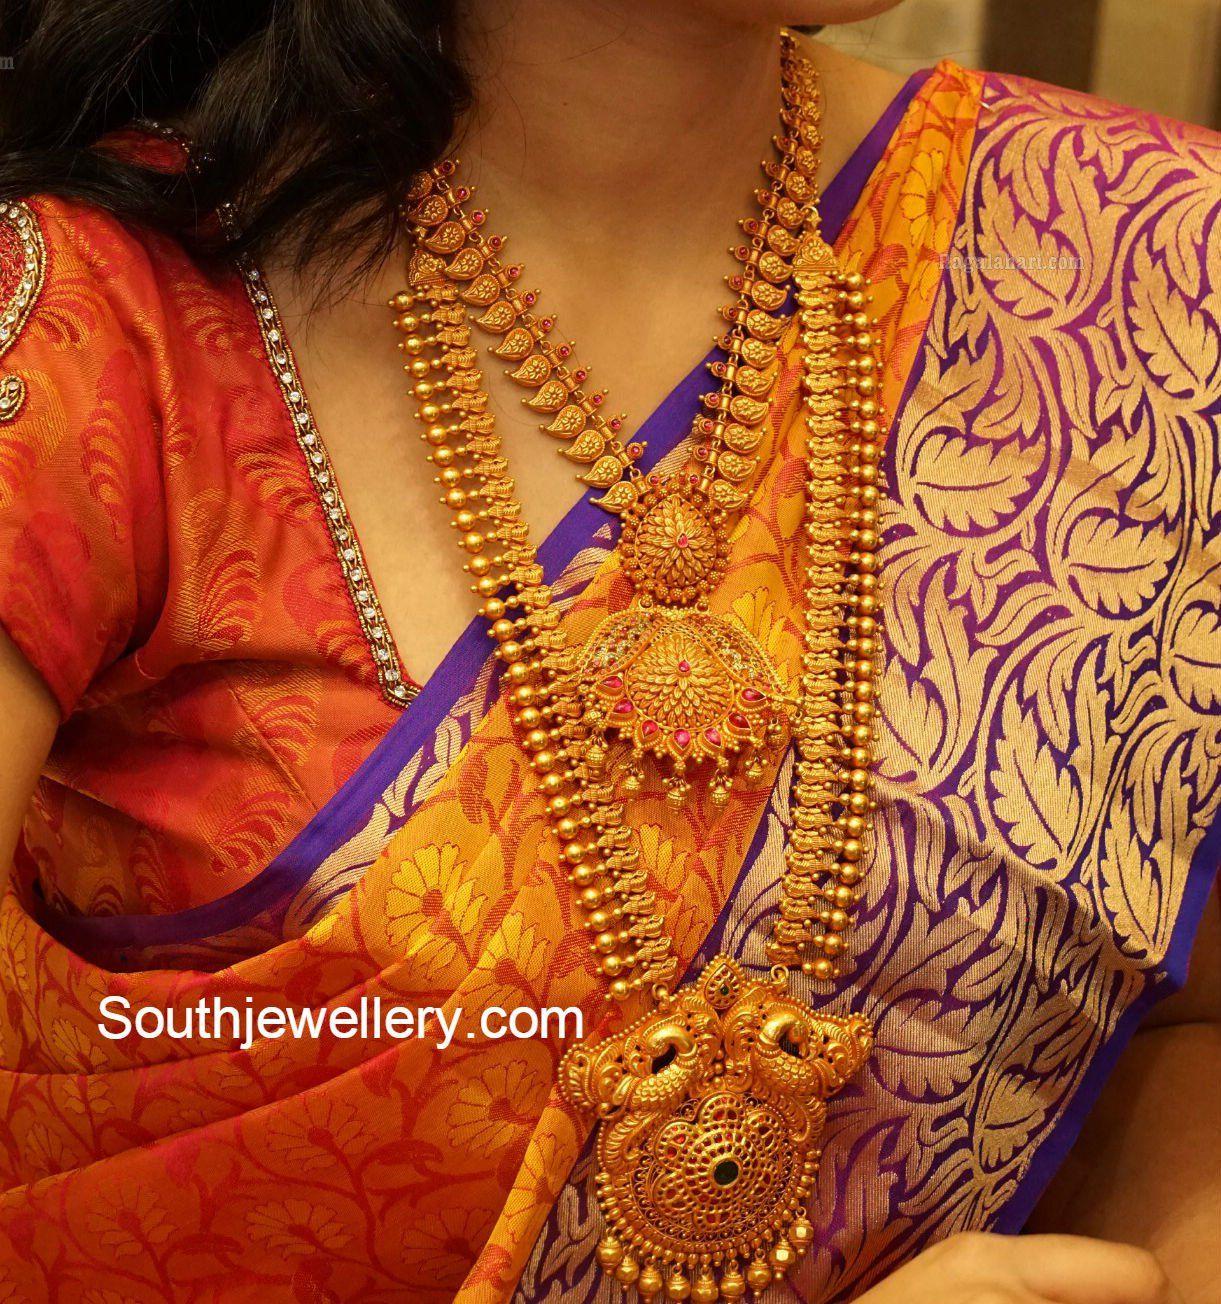 Suhasini in gundla haram jewellery designs - Vaddanam Latest Jewelry Designs Page 6 Of 28 Jewellery Designs